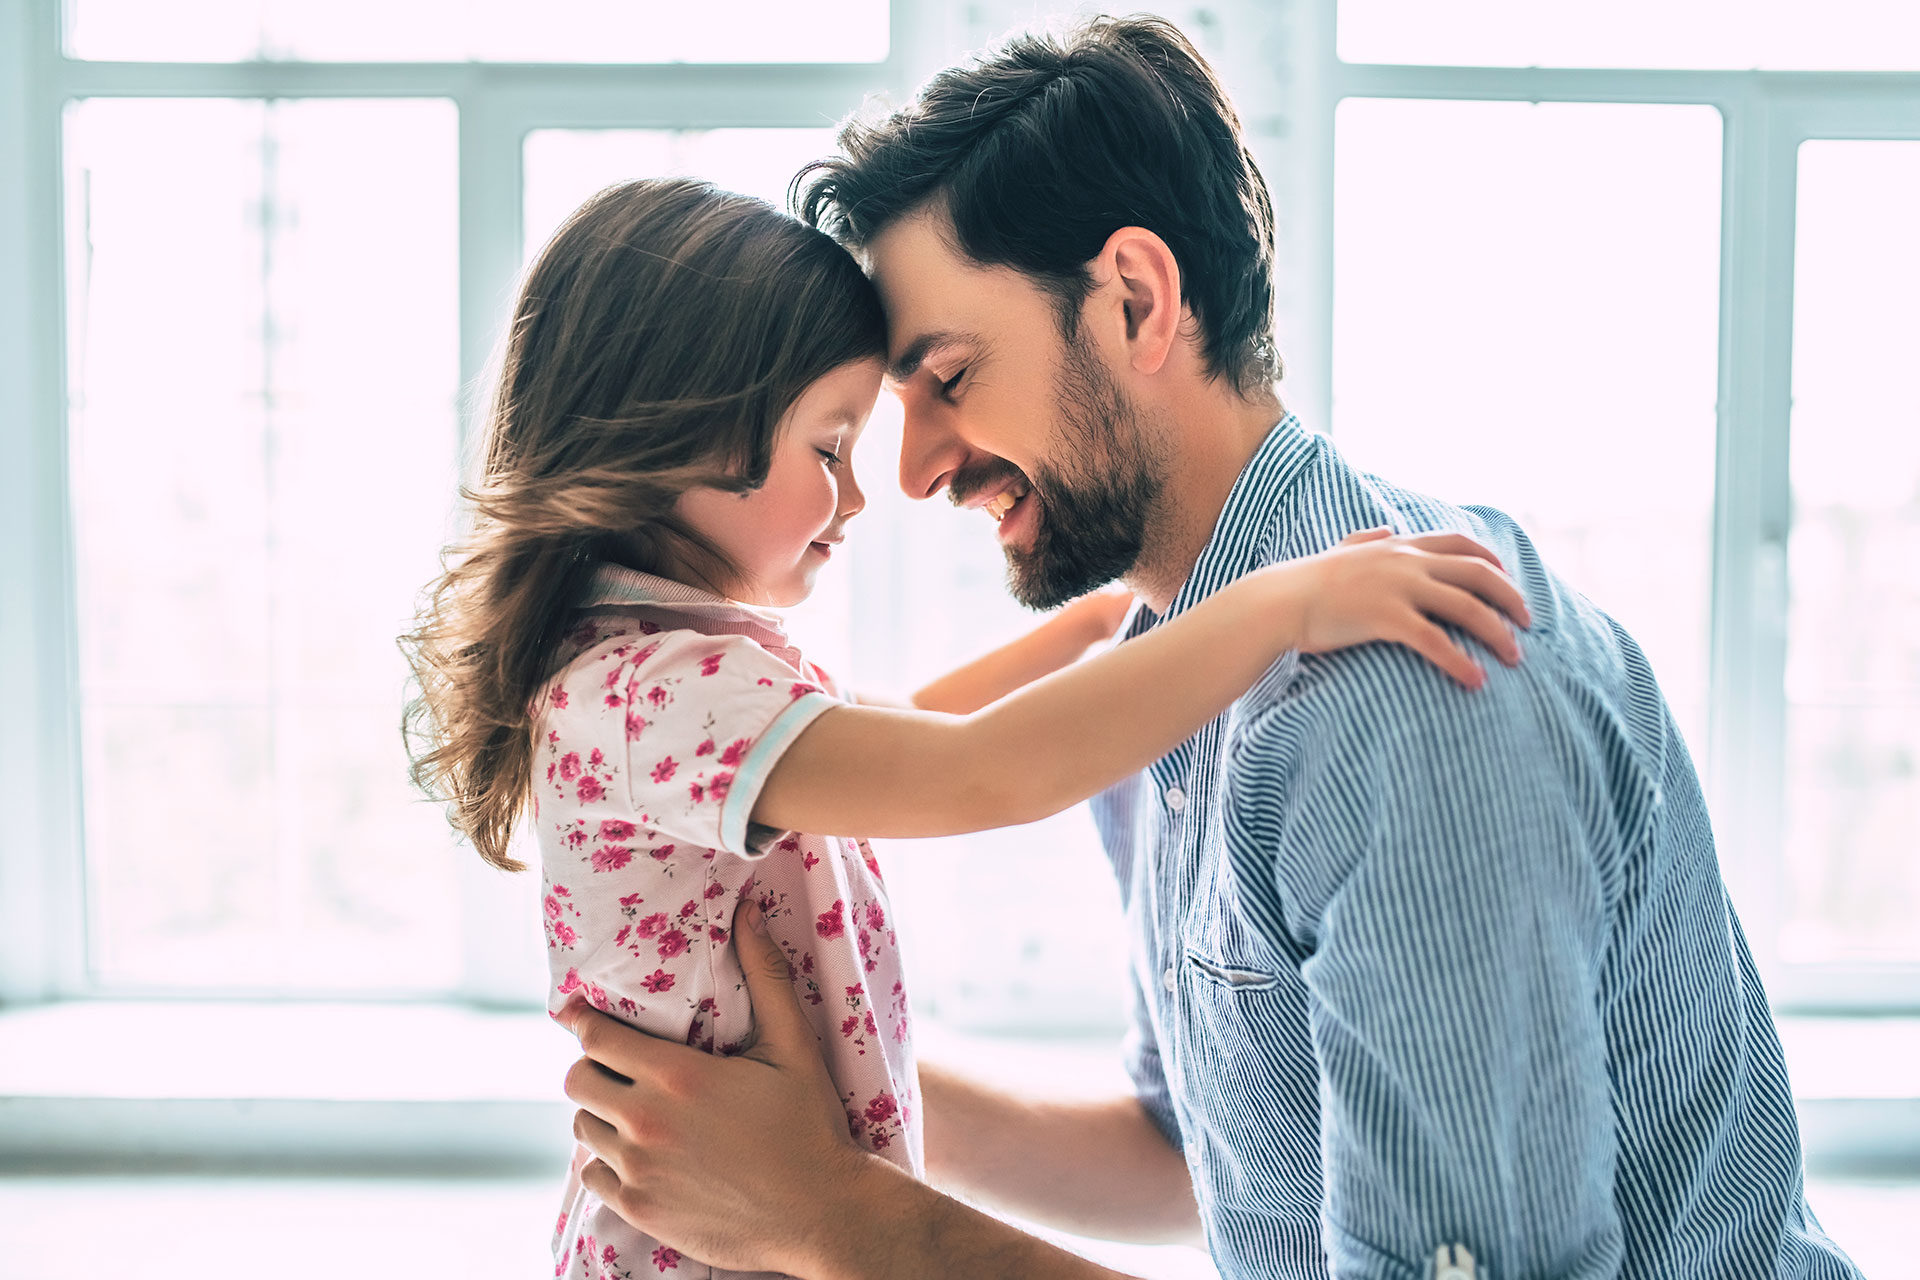 test dna paternità informativo